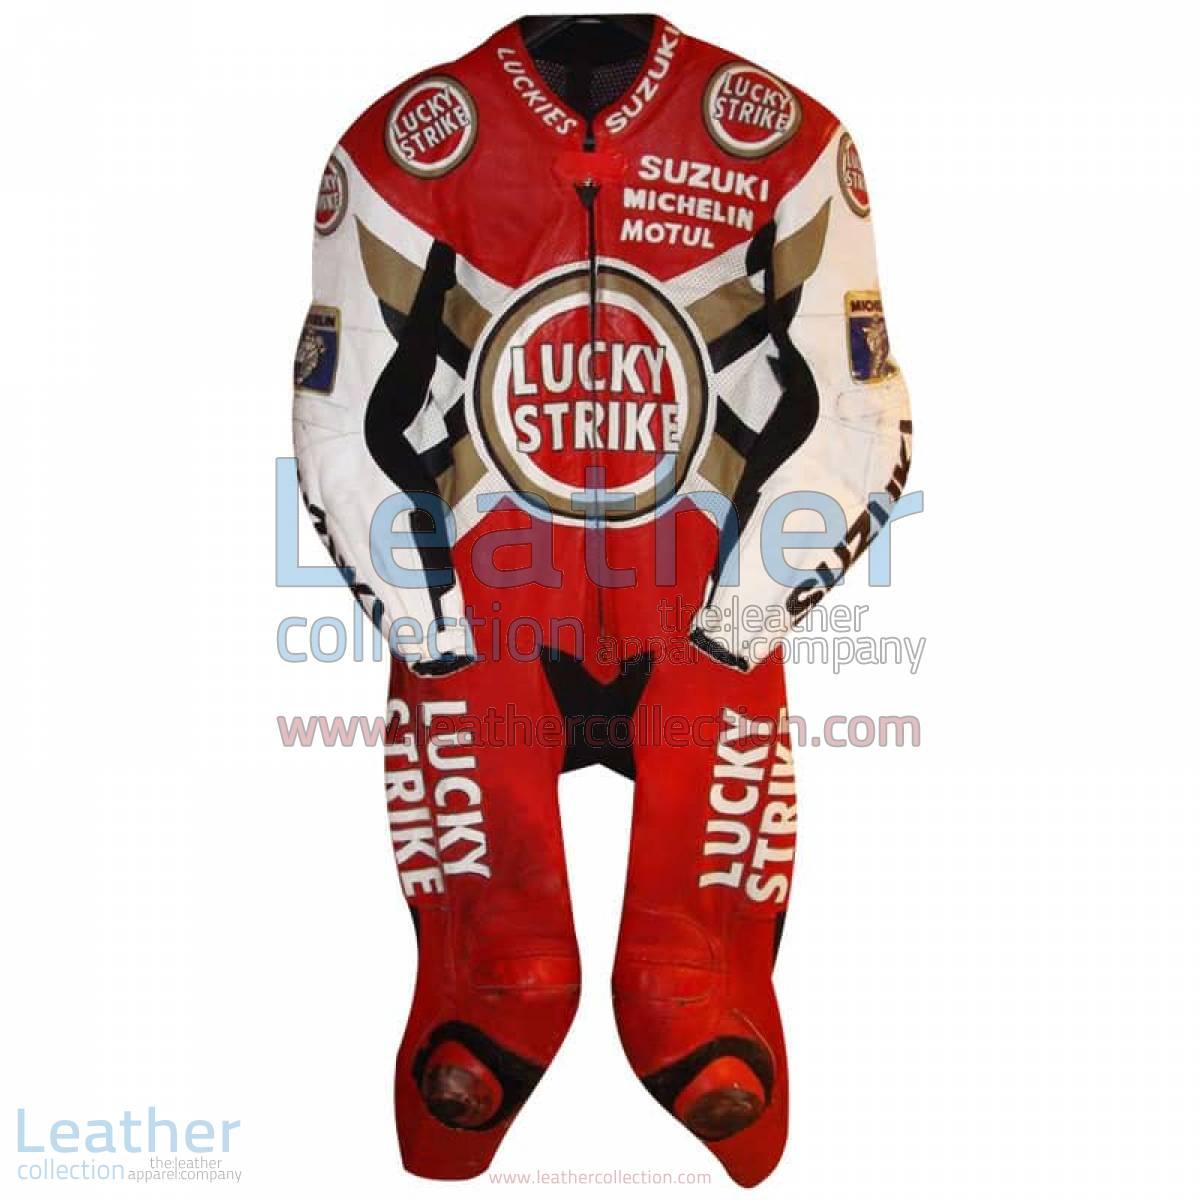 Anthony Gobert Suzuki Lucky Strike 1997 MotoGP Leathers | anthony gobert,motogp leathers